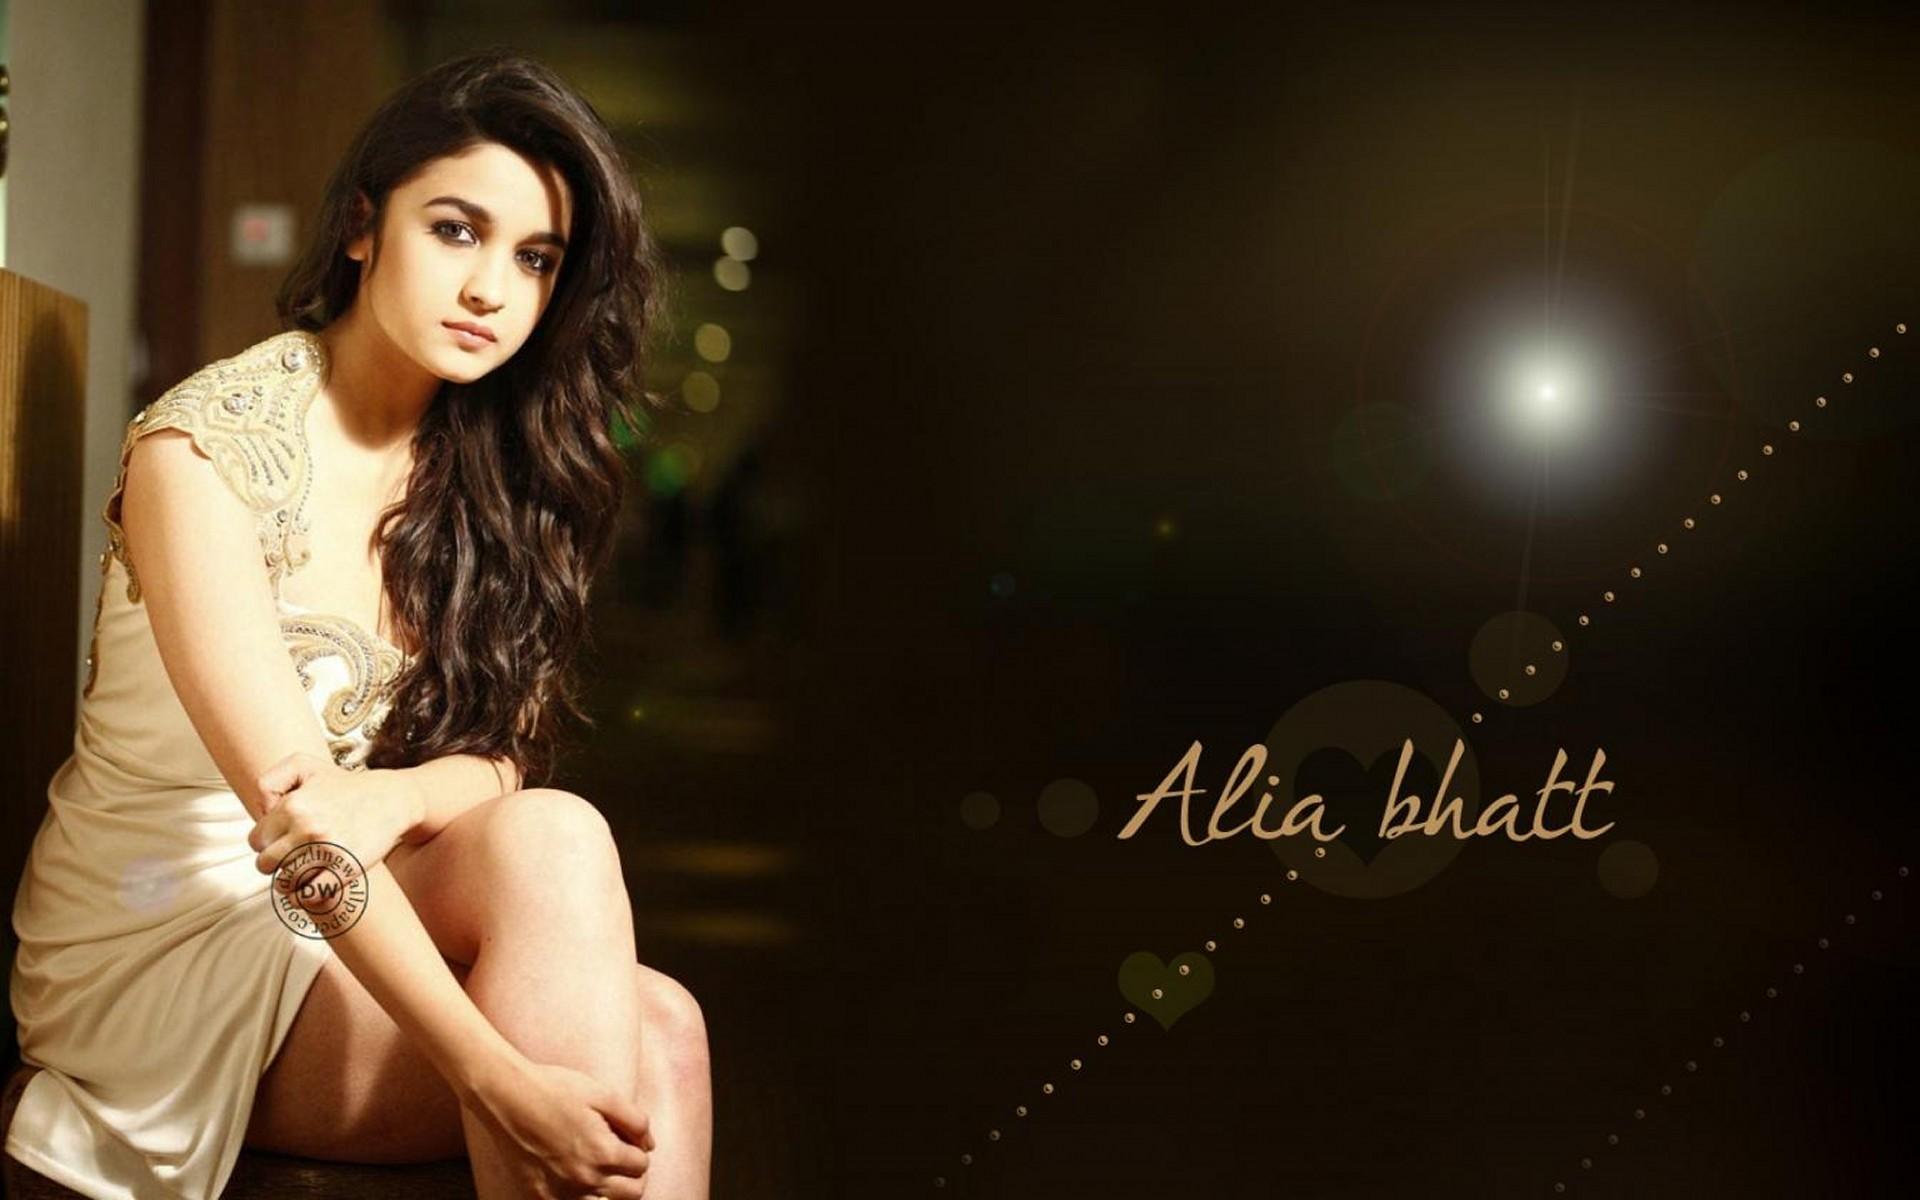 alia bhatt image 20 most beautiful collections best